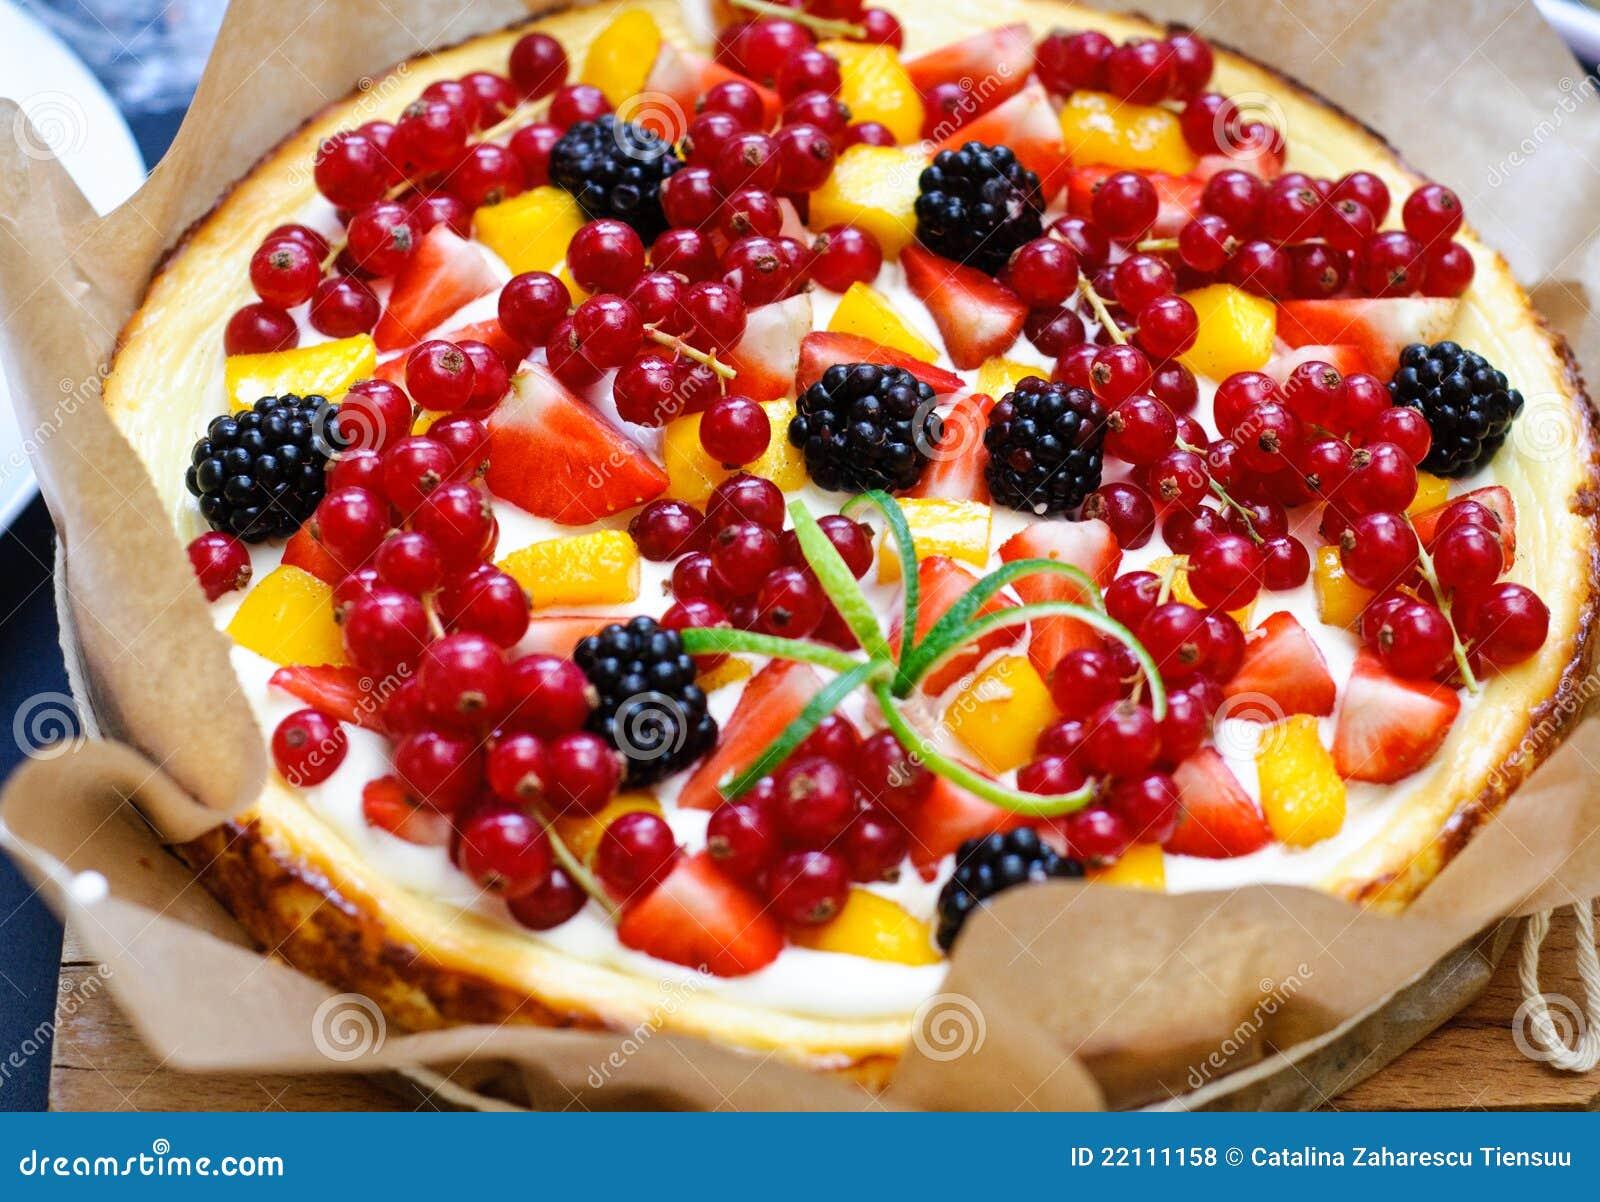 Trägt Vanillekäsekuchen Früchte